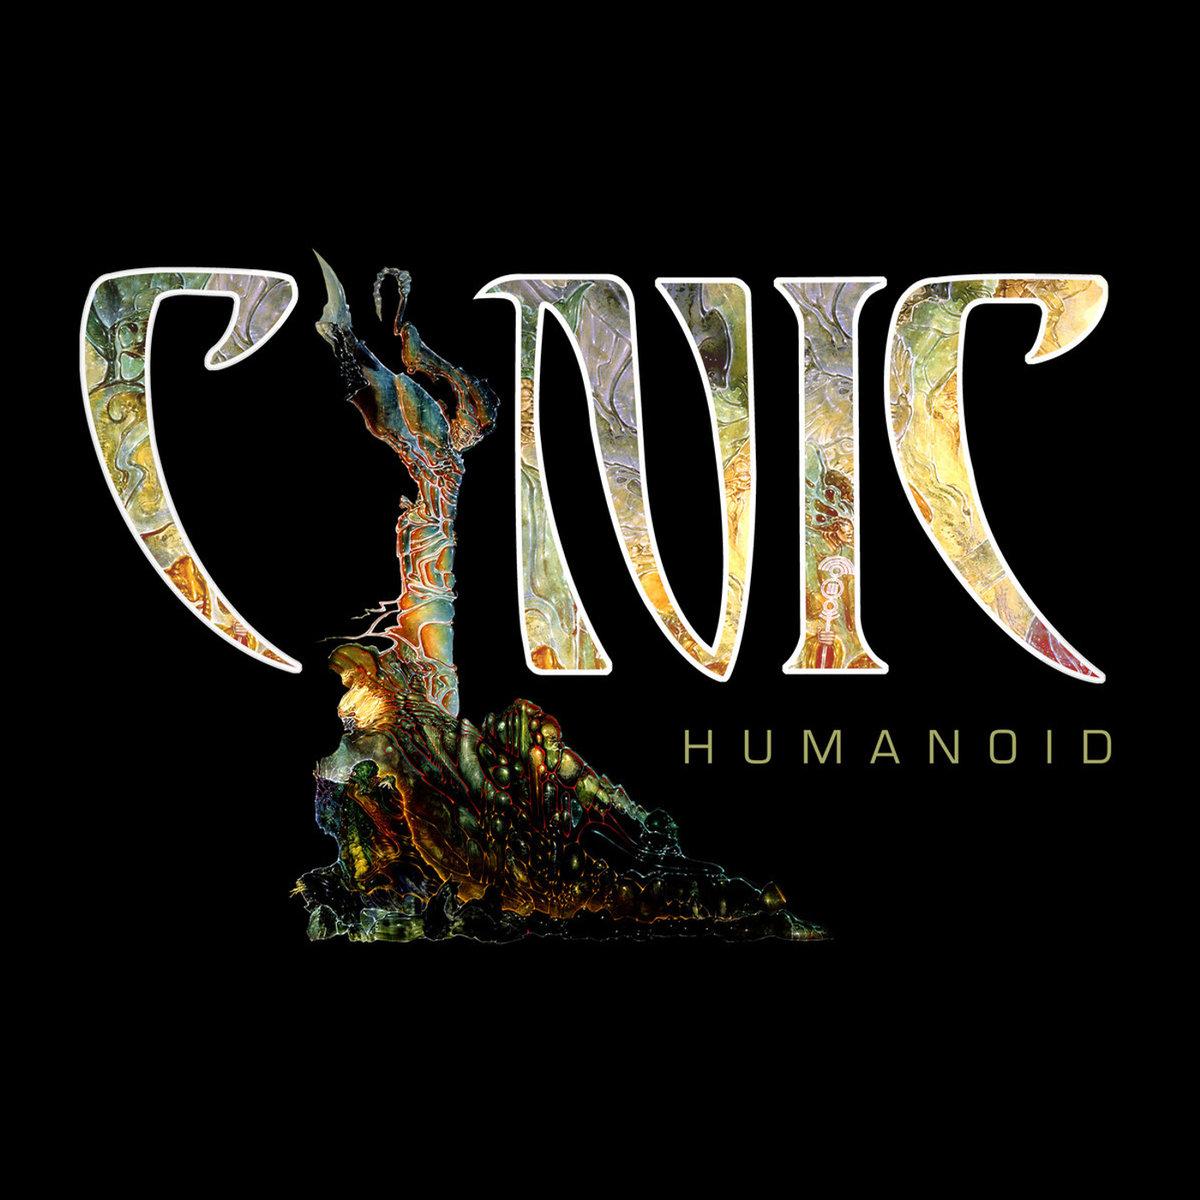 CYNIC - Humanoid cover